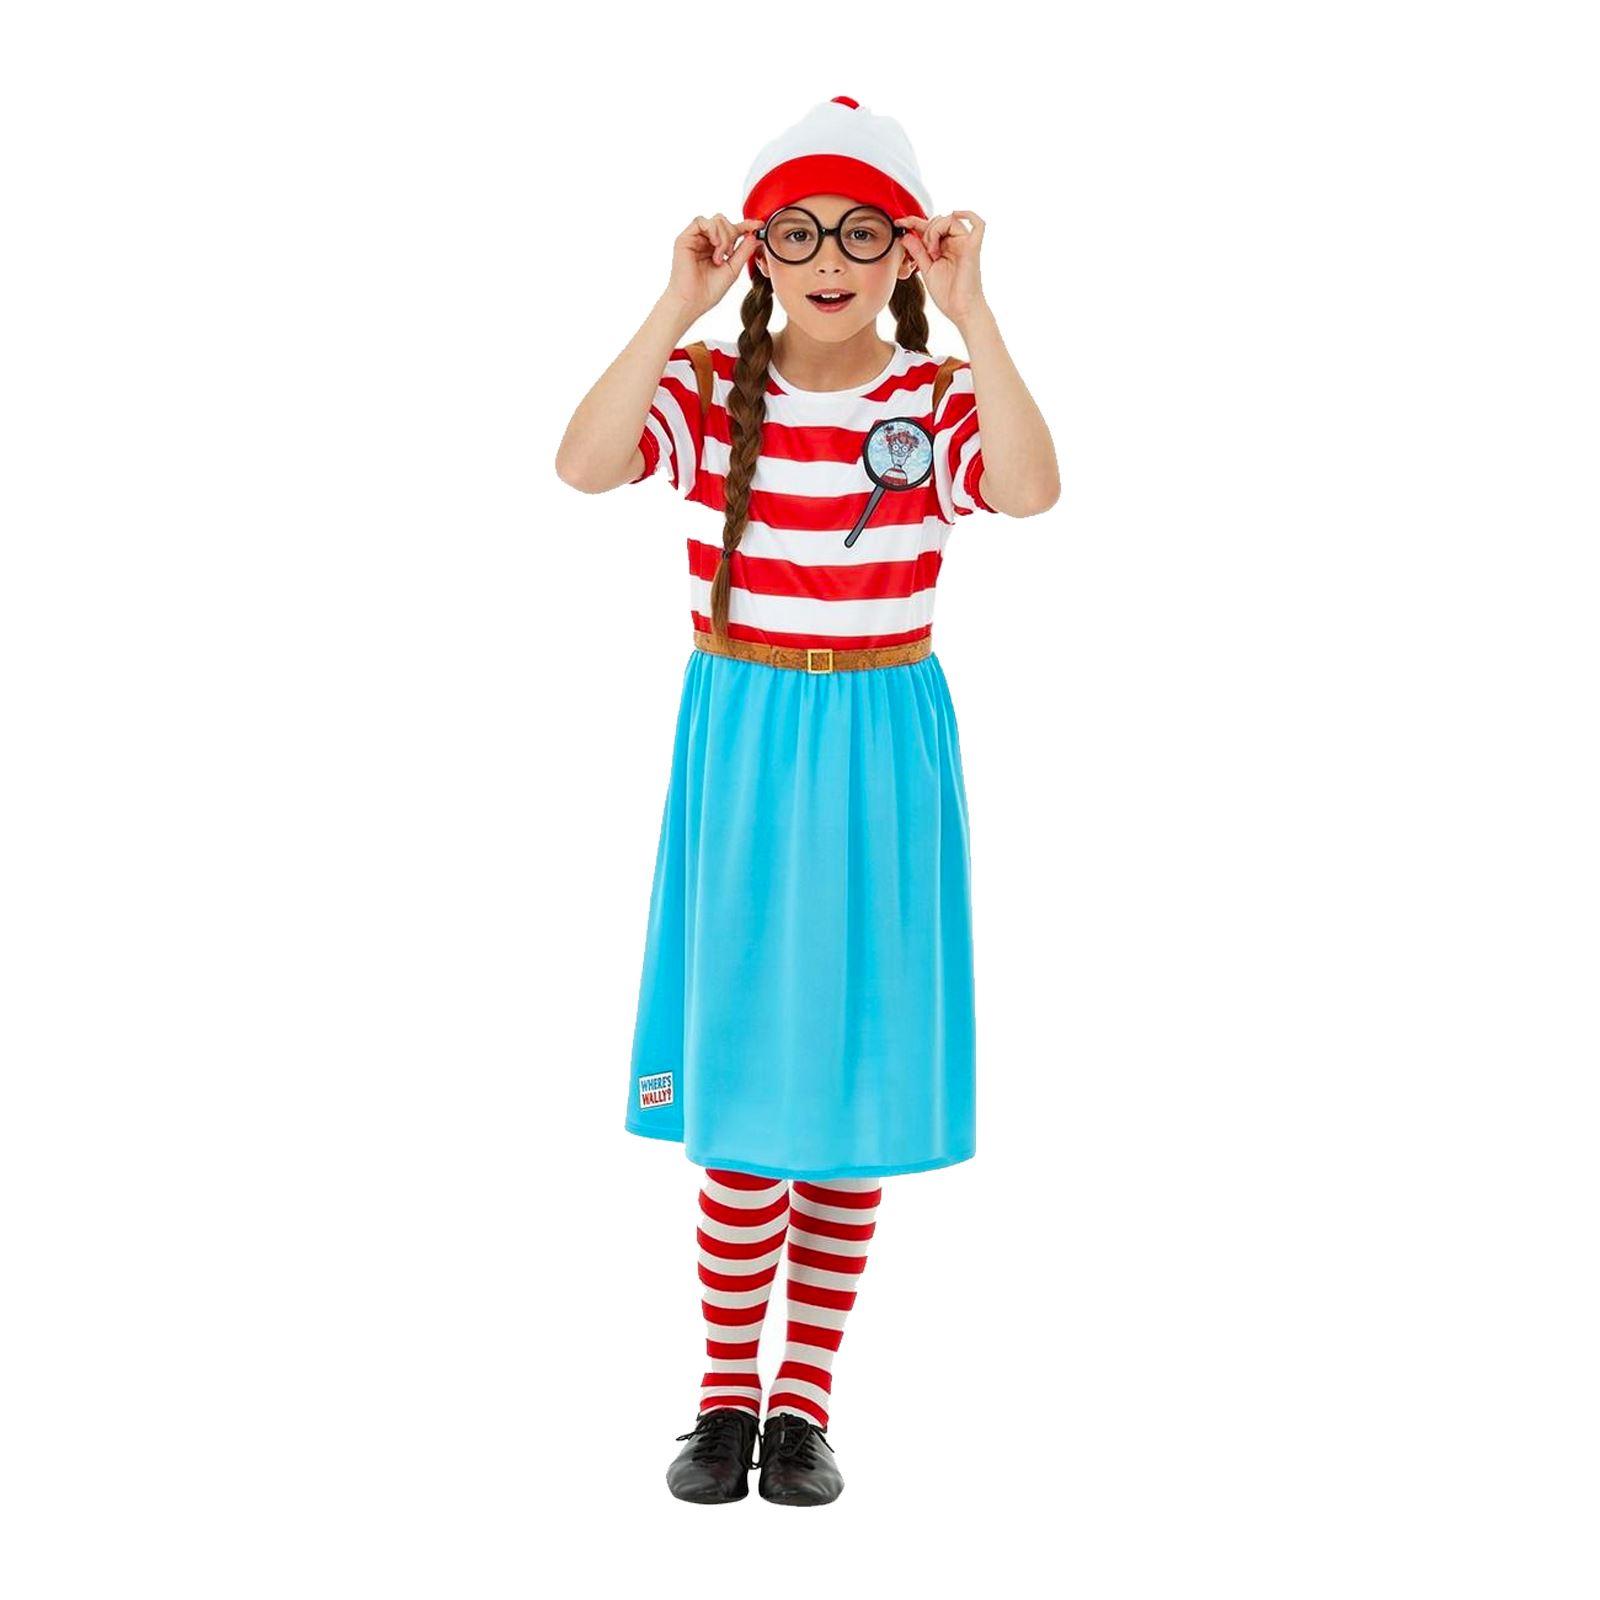 Wenda Book Day Character Fancy Dress Costume Kids Girls Where/'s Wally